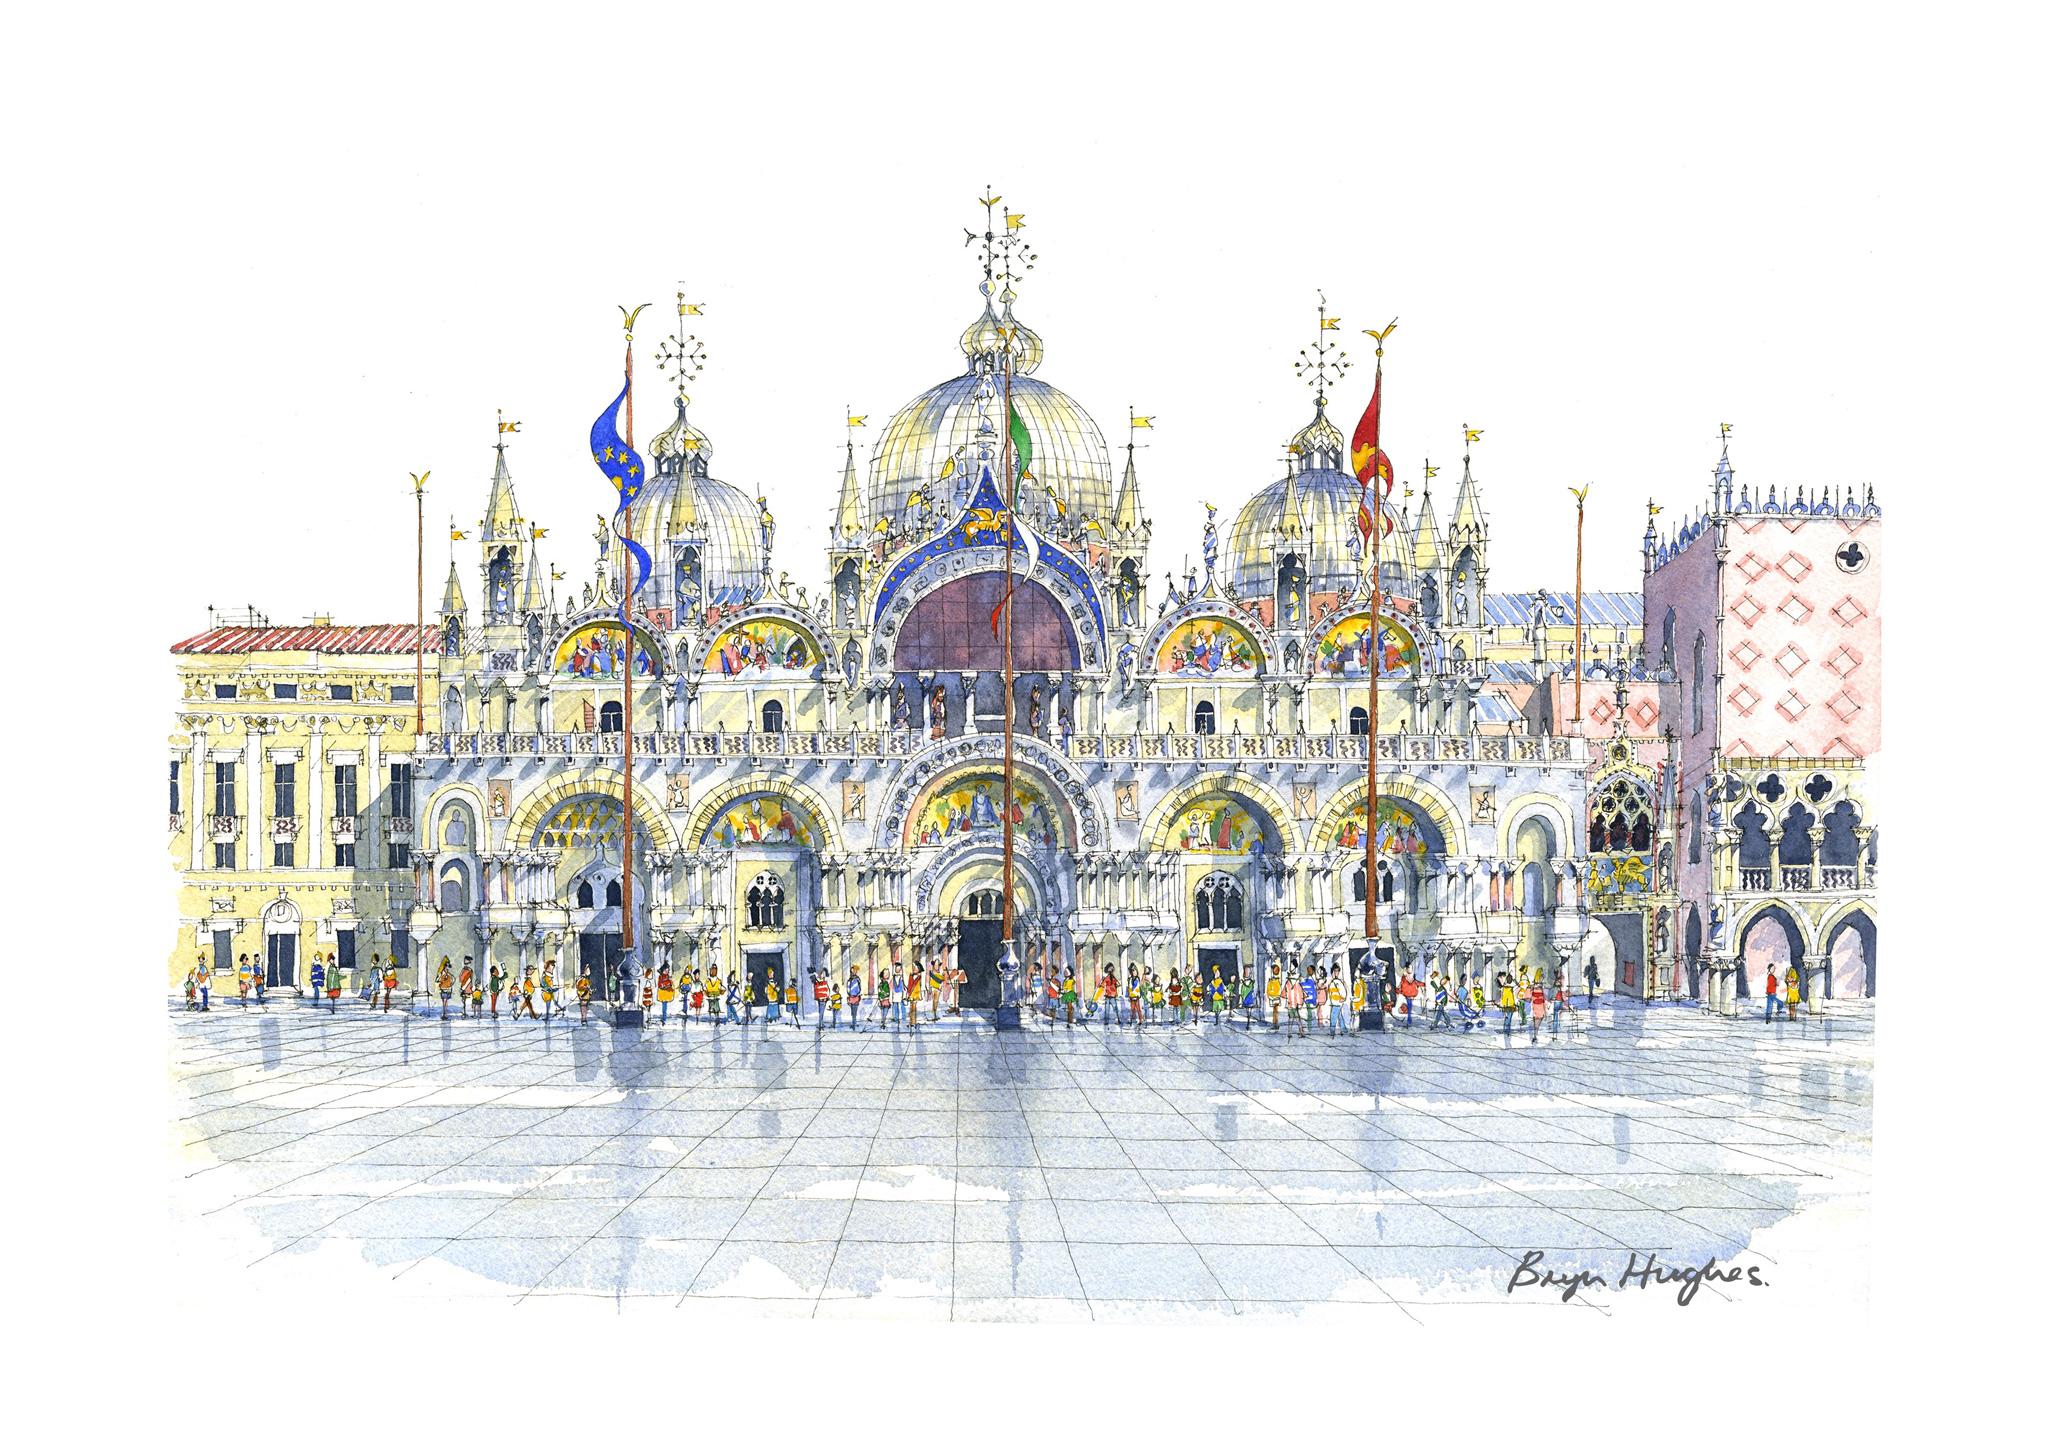 Watercolour painting of Saint Mark's Basilica. Venice